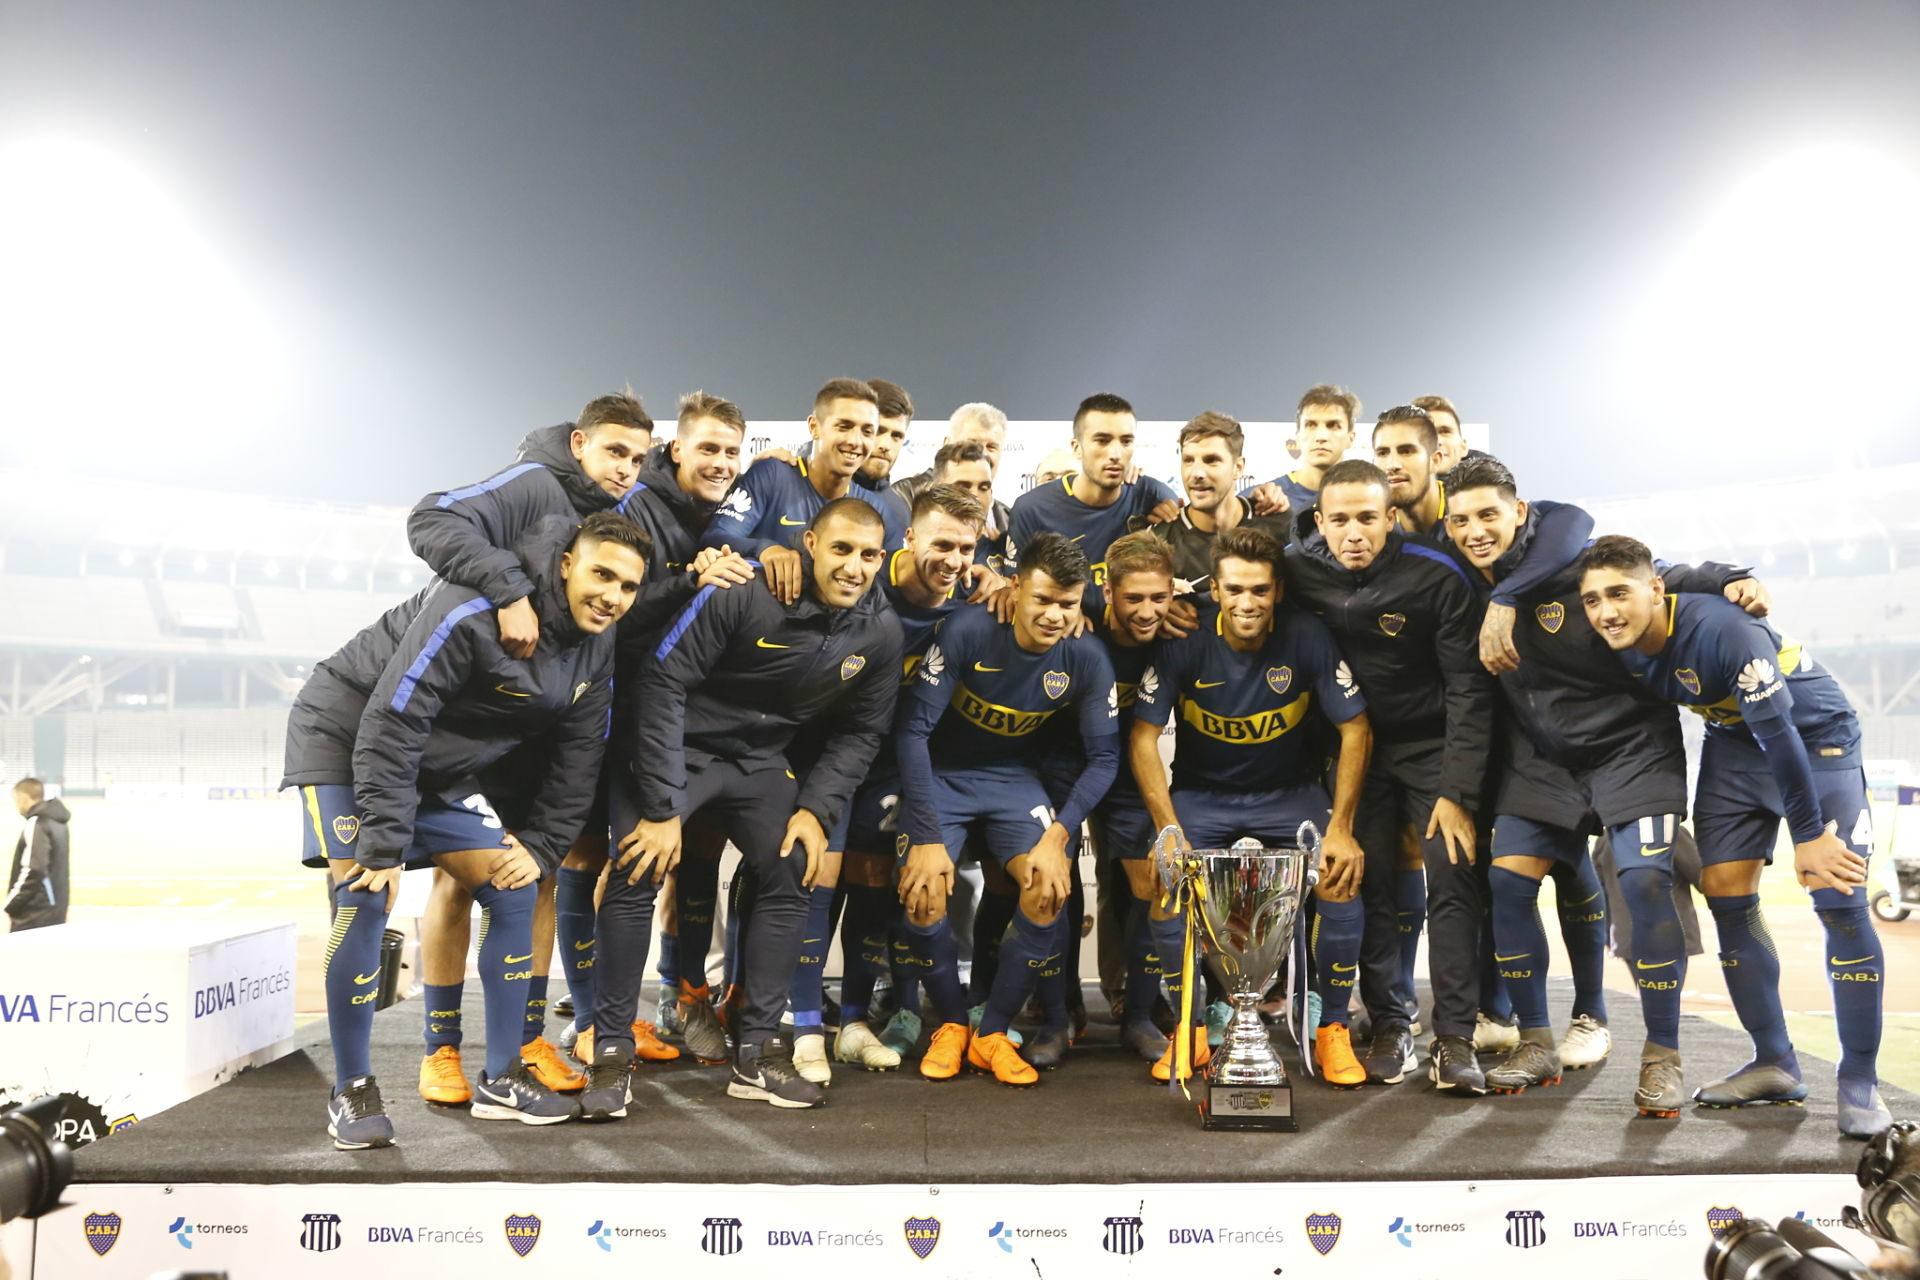 El plantel de Boca posa con la Copa BBVA Francés